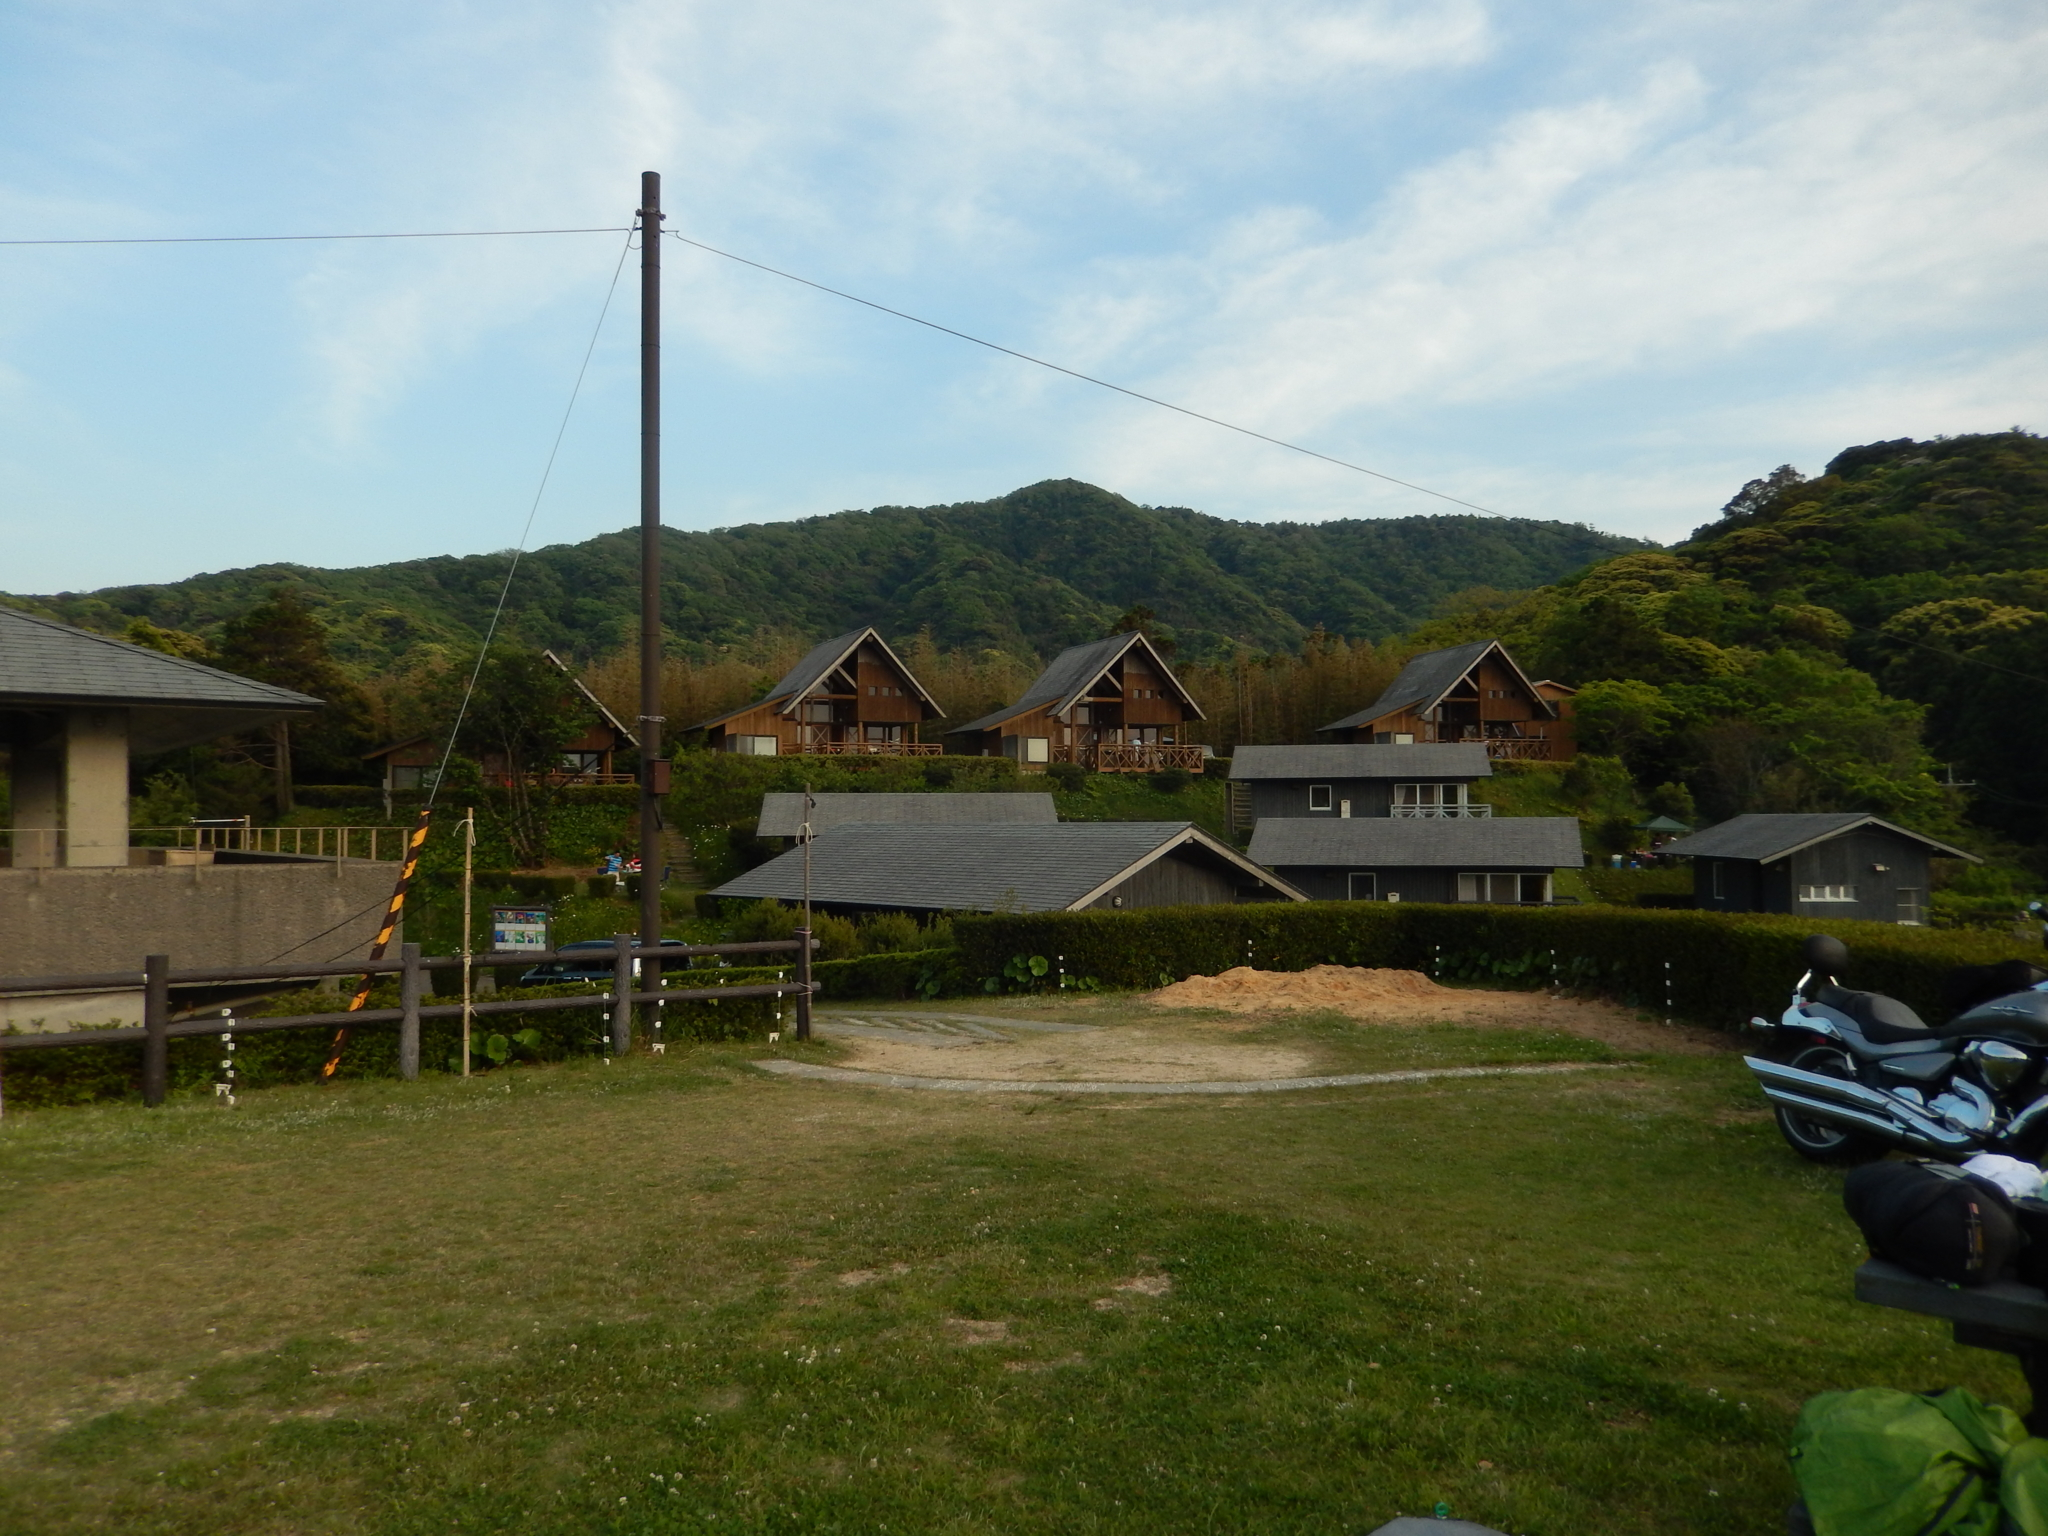 f:id:ToshUeno:20150502181806j:plain